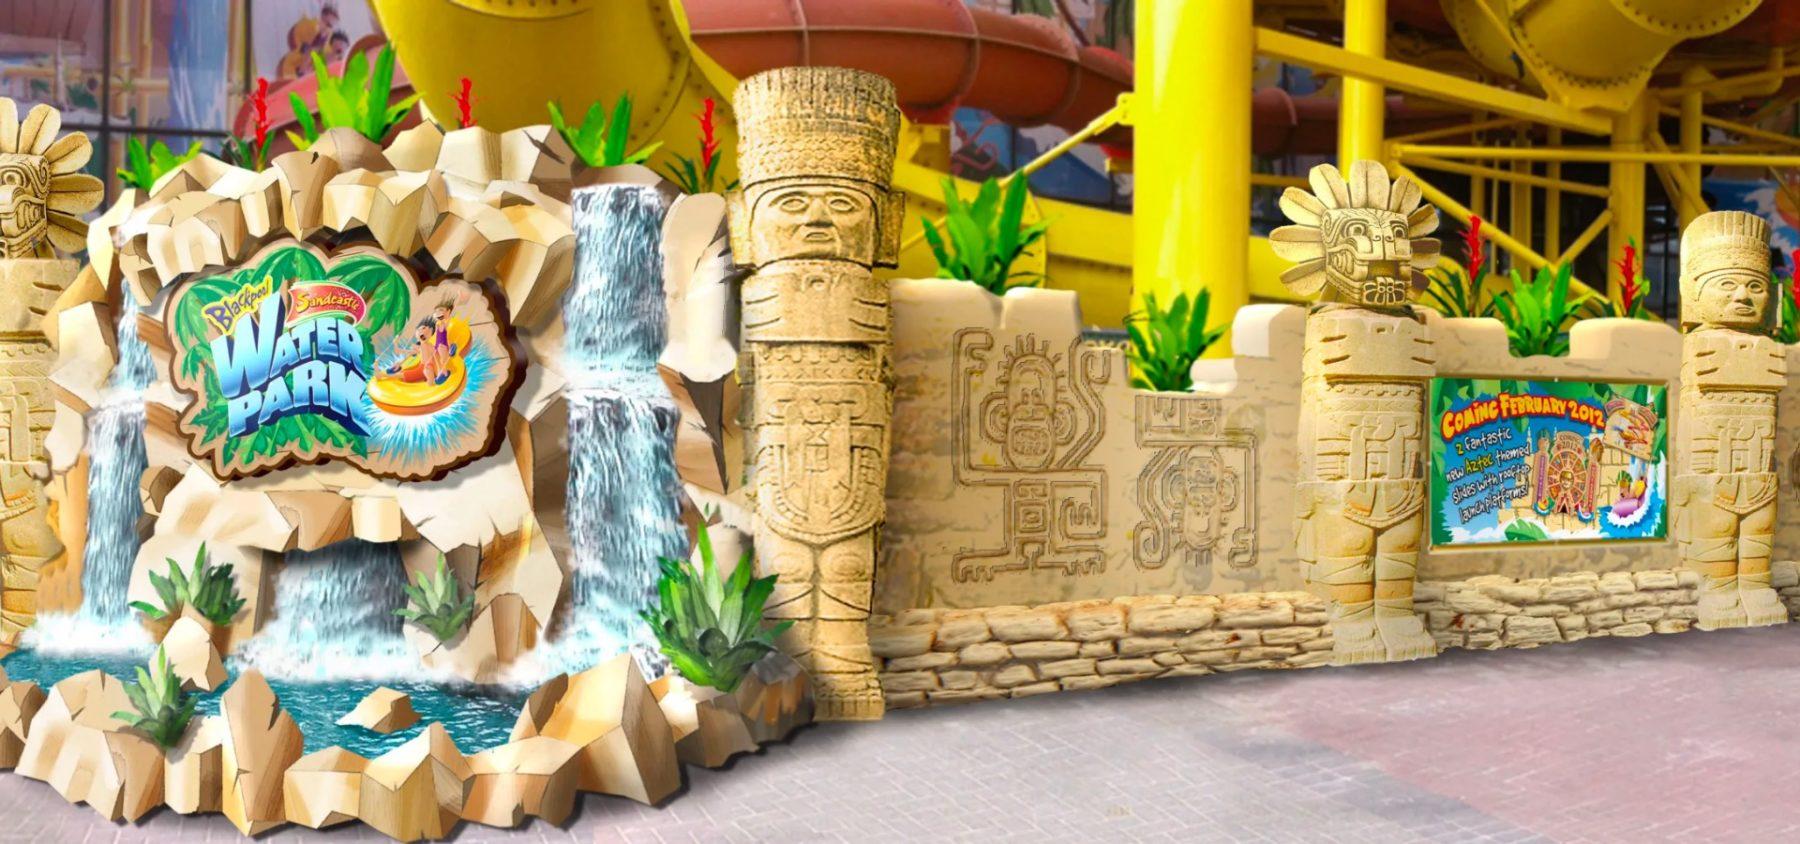 Sandcastle Waterpark Aztec area